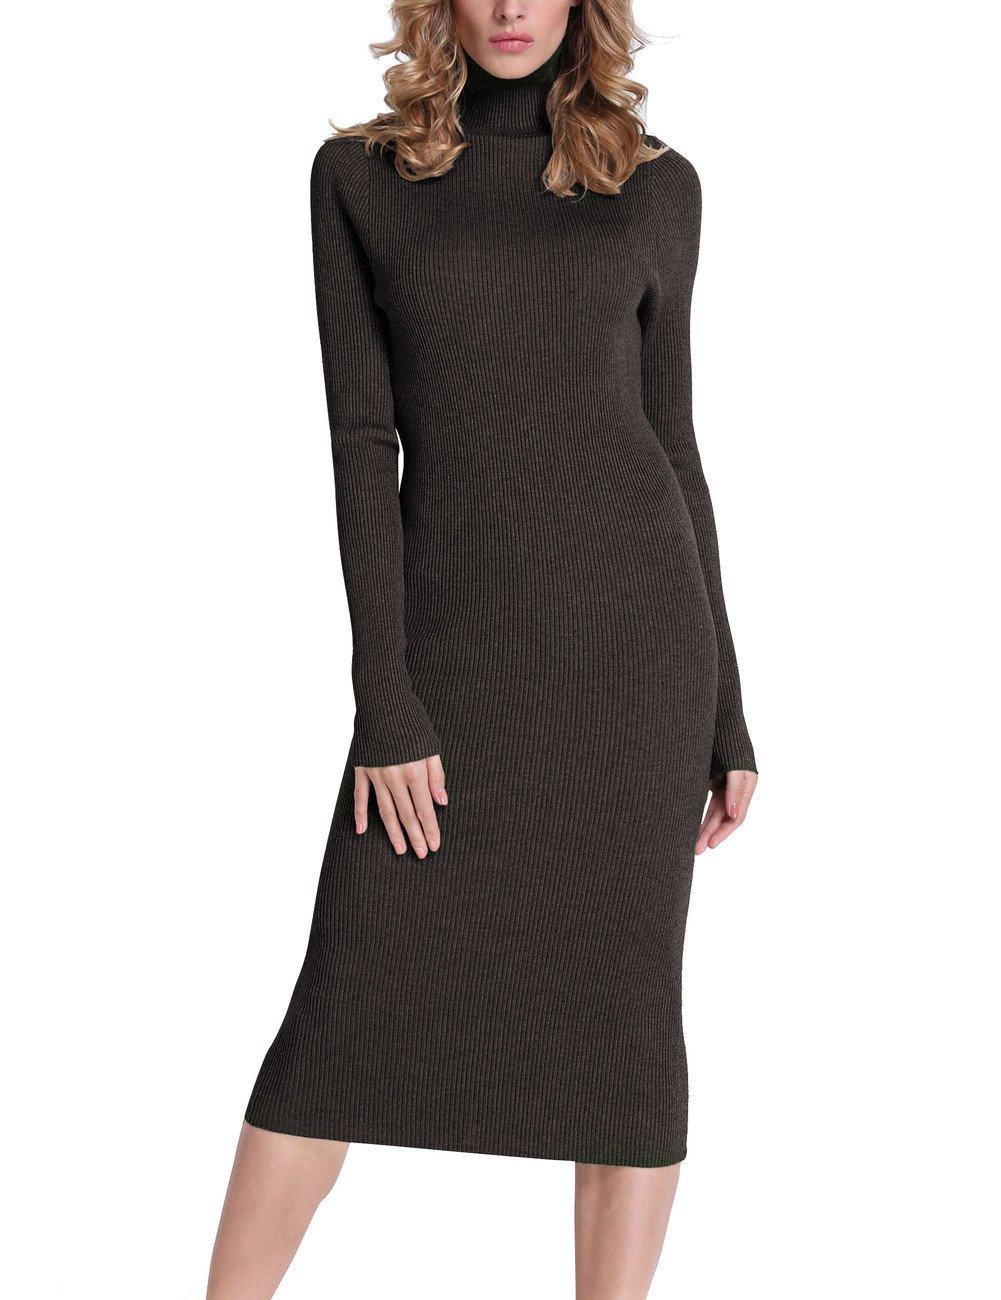 Rocorose Women's Turtleneck Sweater Elegant Ribbed Long Sleeve Sweater Dress Deep Coffee XL